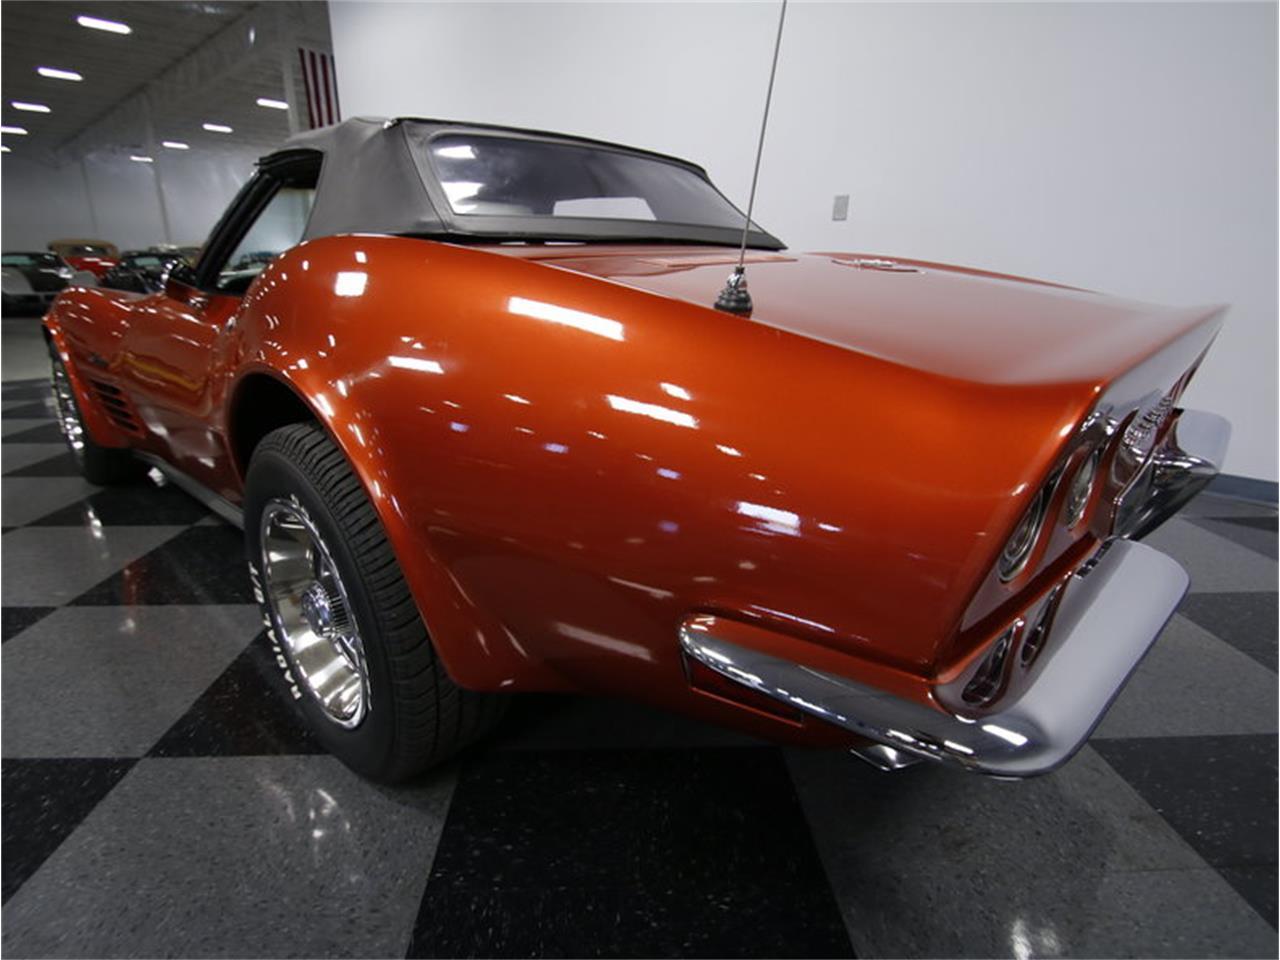 Large Picture of 1970 Chevrolet Corvette located in North Carolina - $27,995.00 - JTQZ